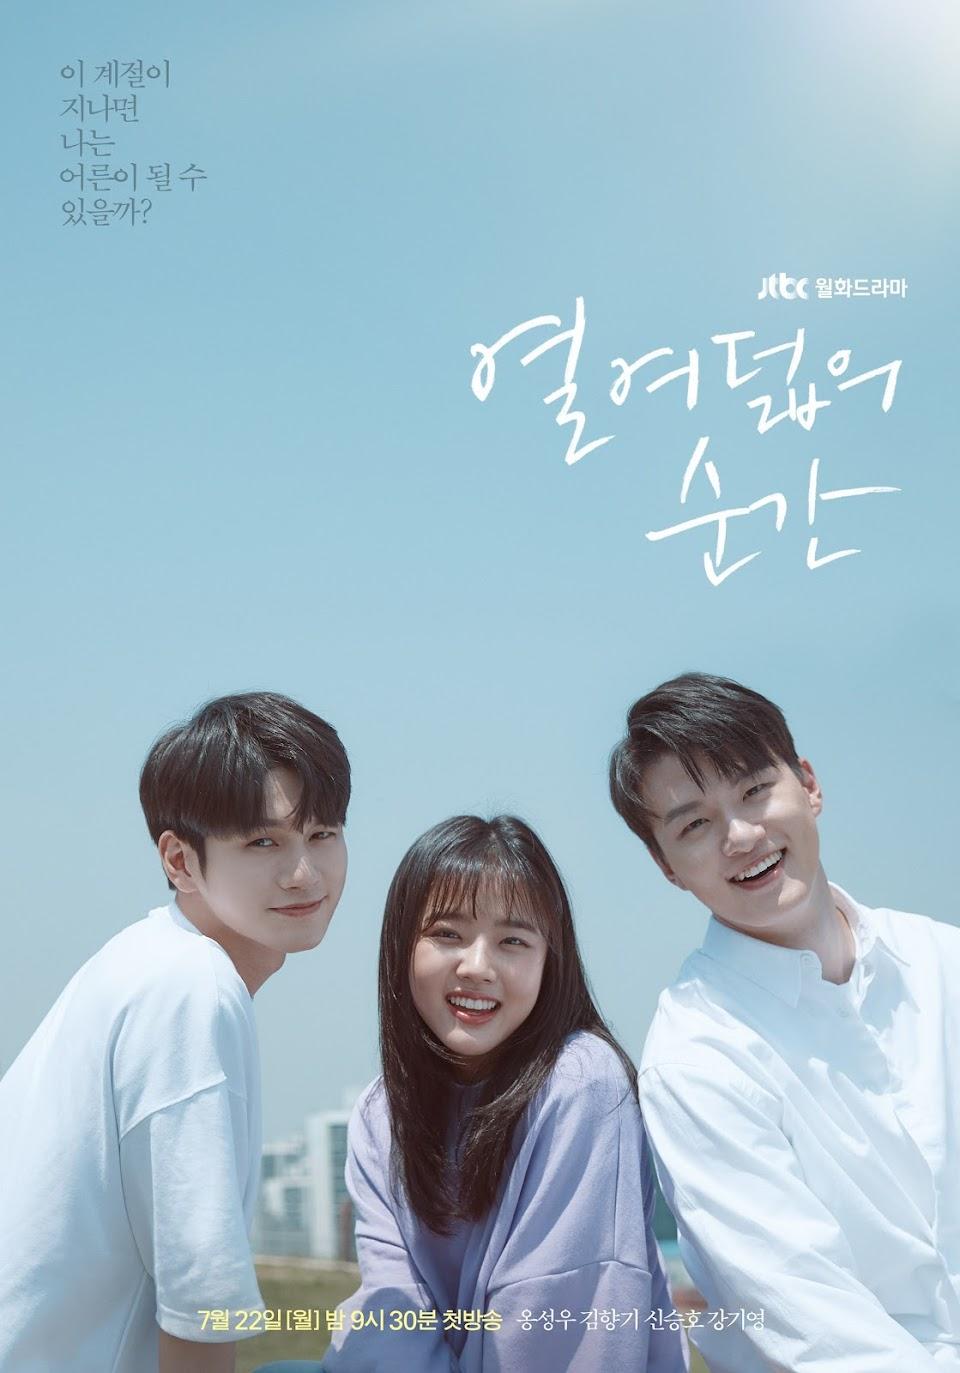 exid hani acting debut 1